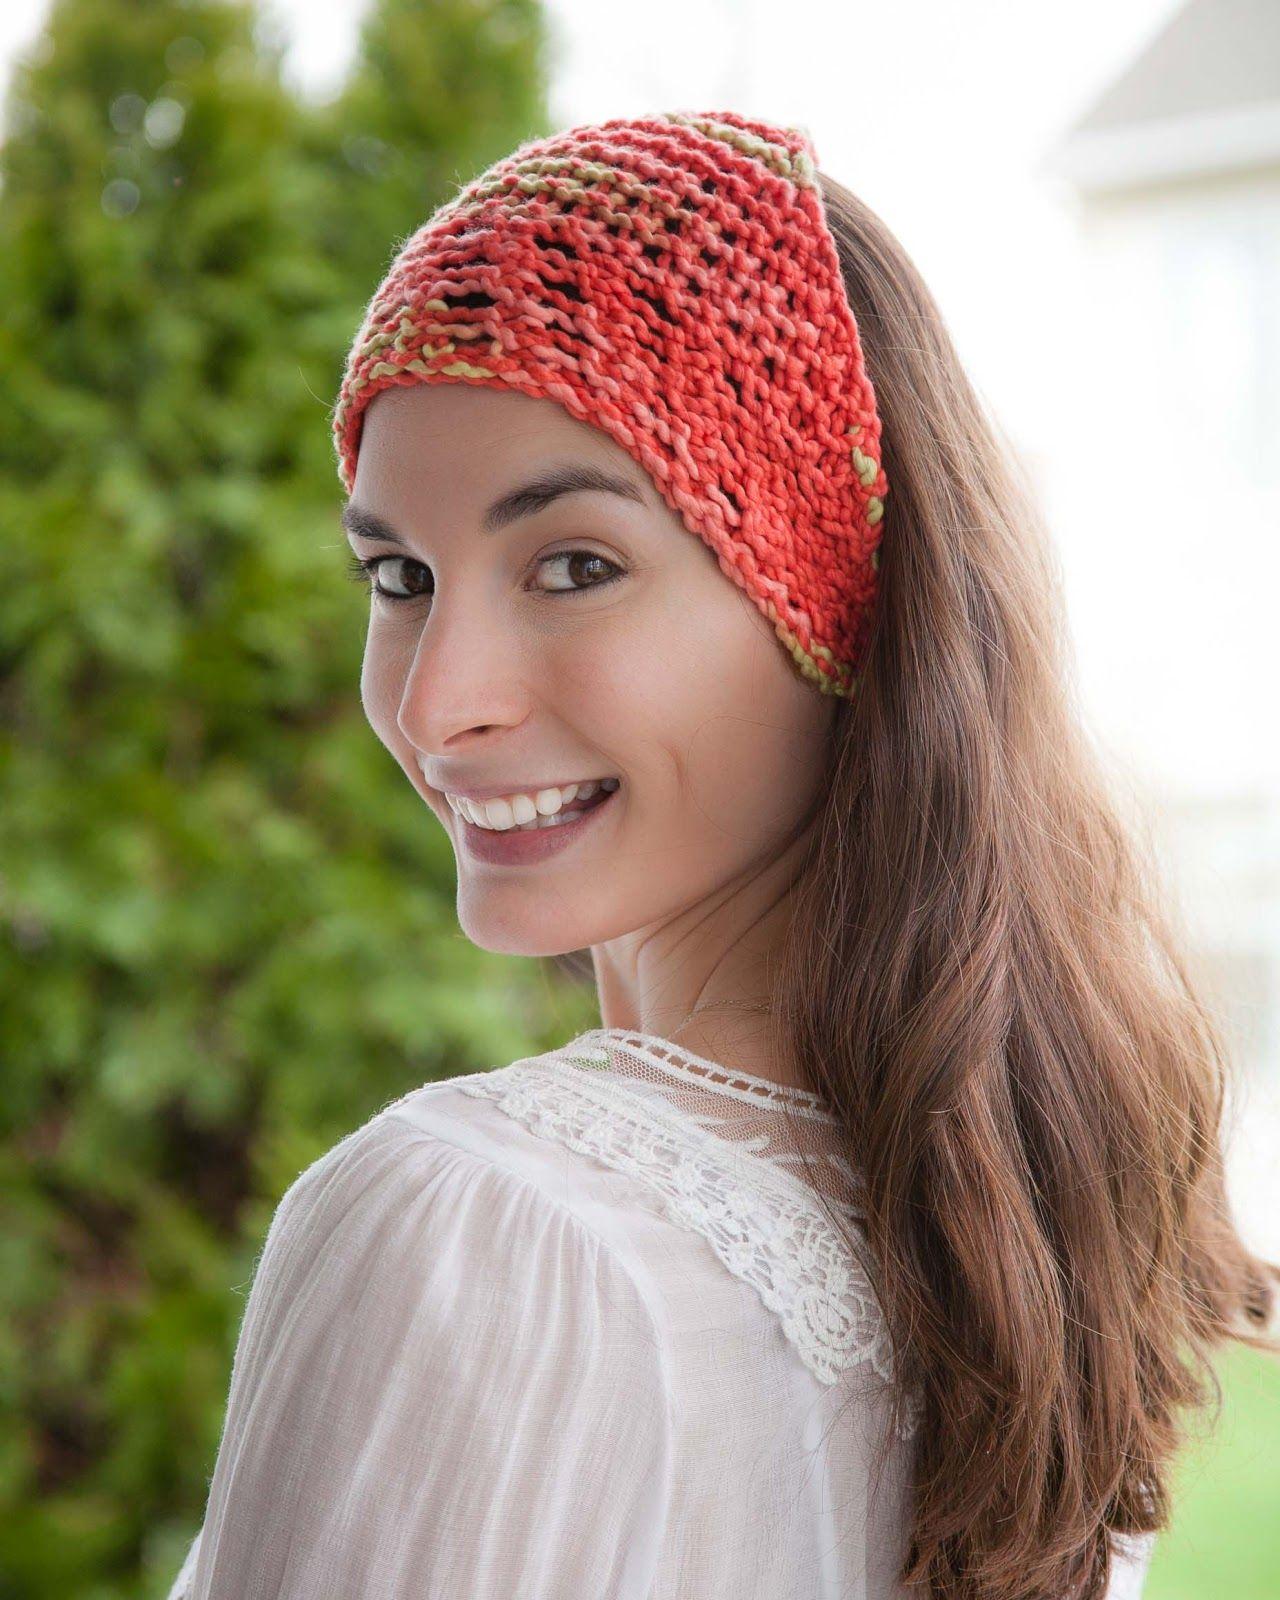 loom knit head wrap bandanna. Cotton head wrap perfect for summer ...